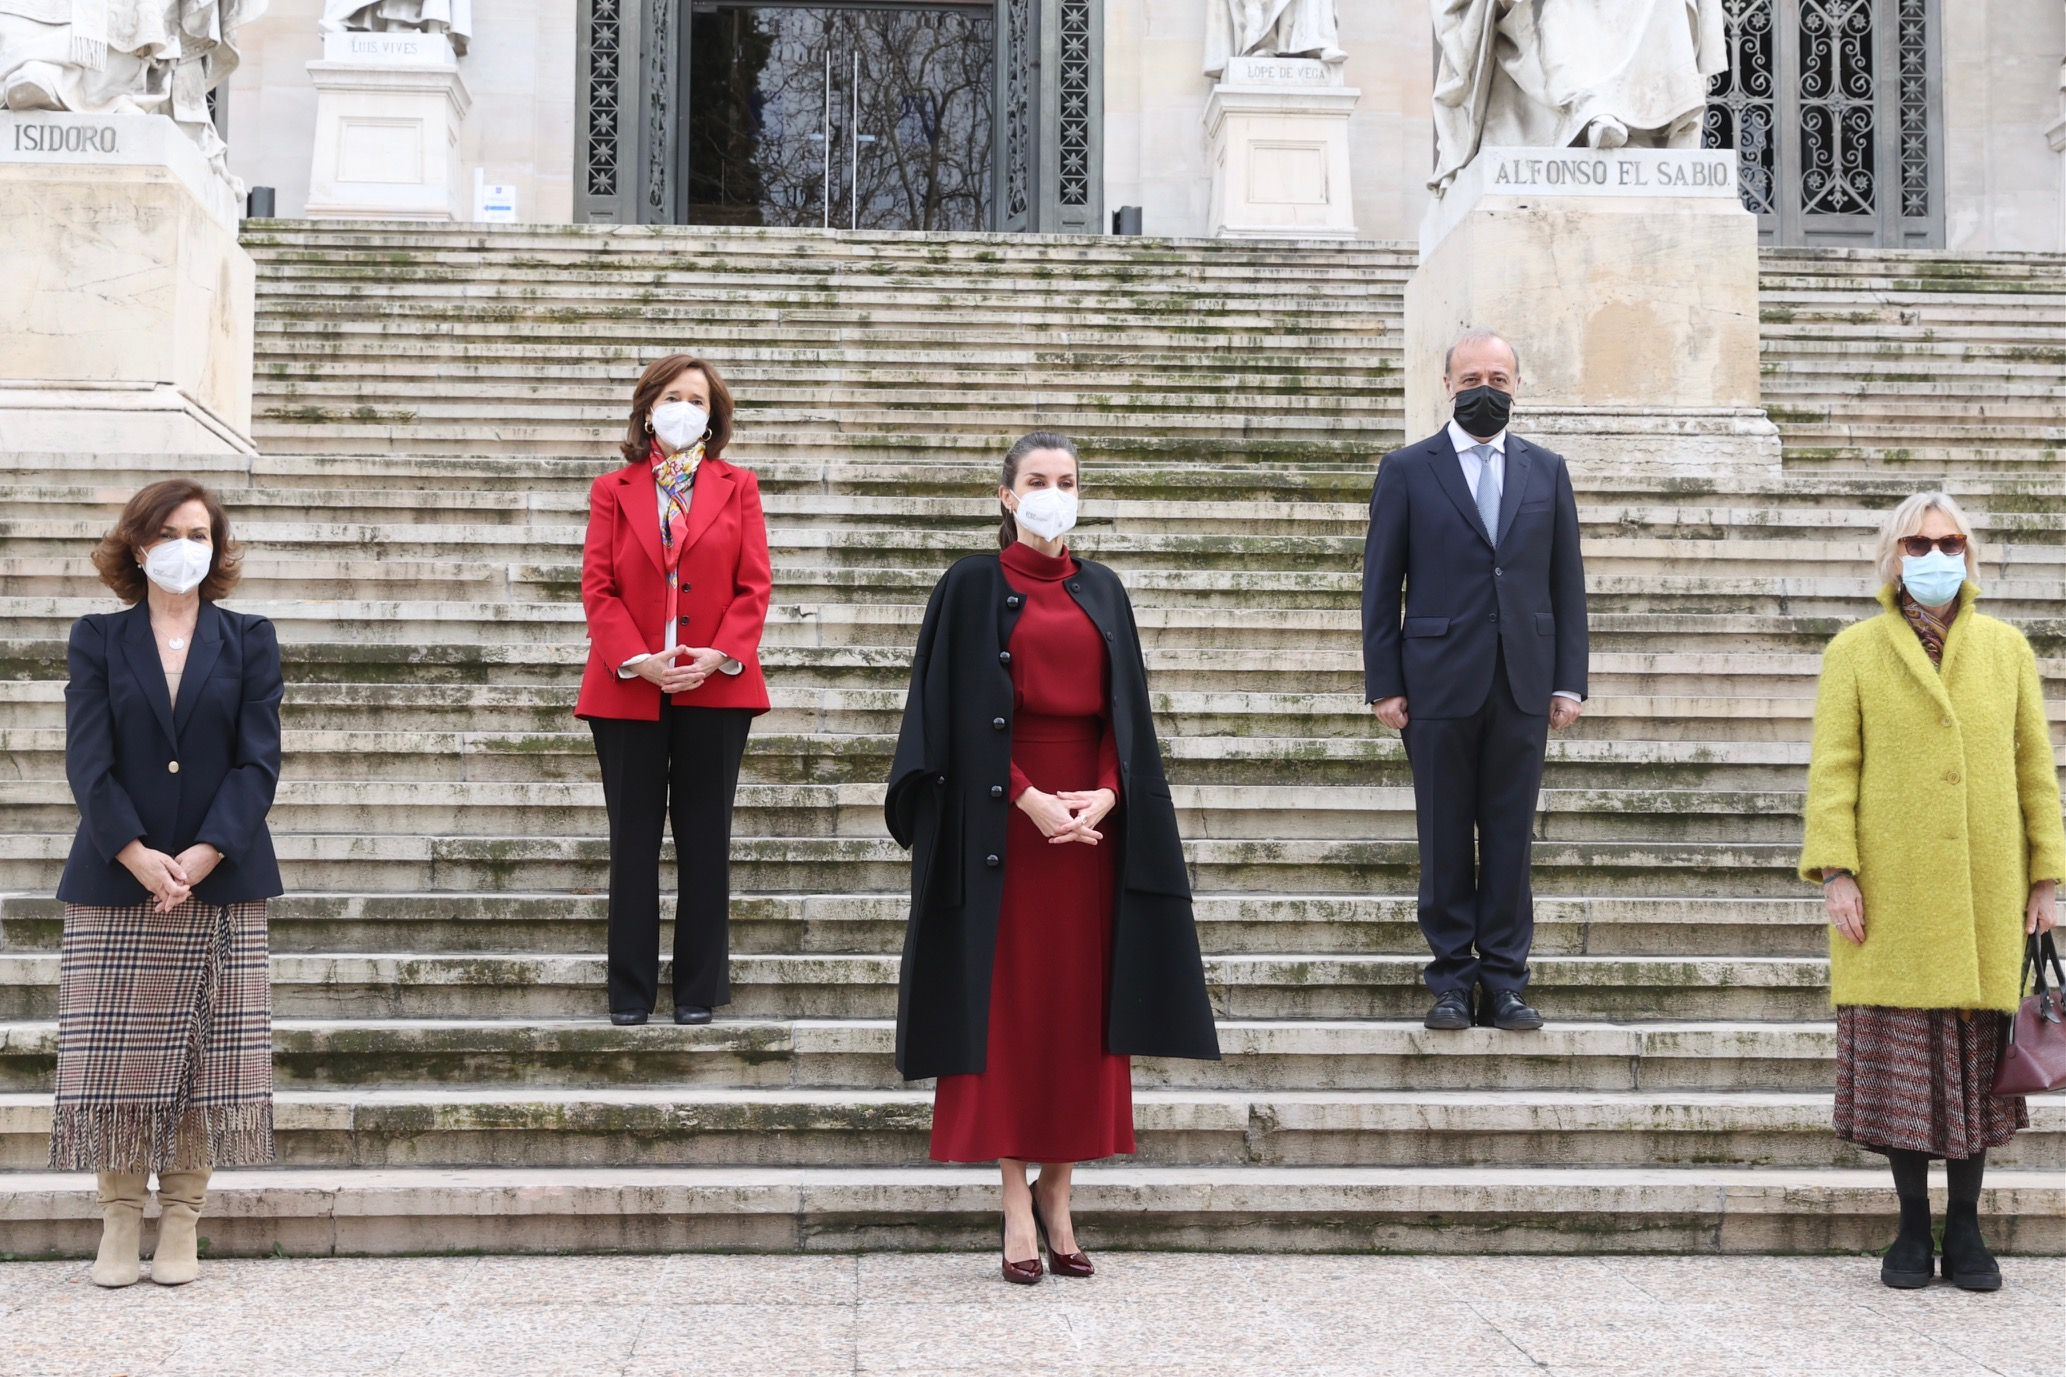 La reina Letizia estrena vestido de edición limitada de Massimo Dutti